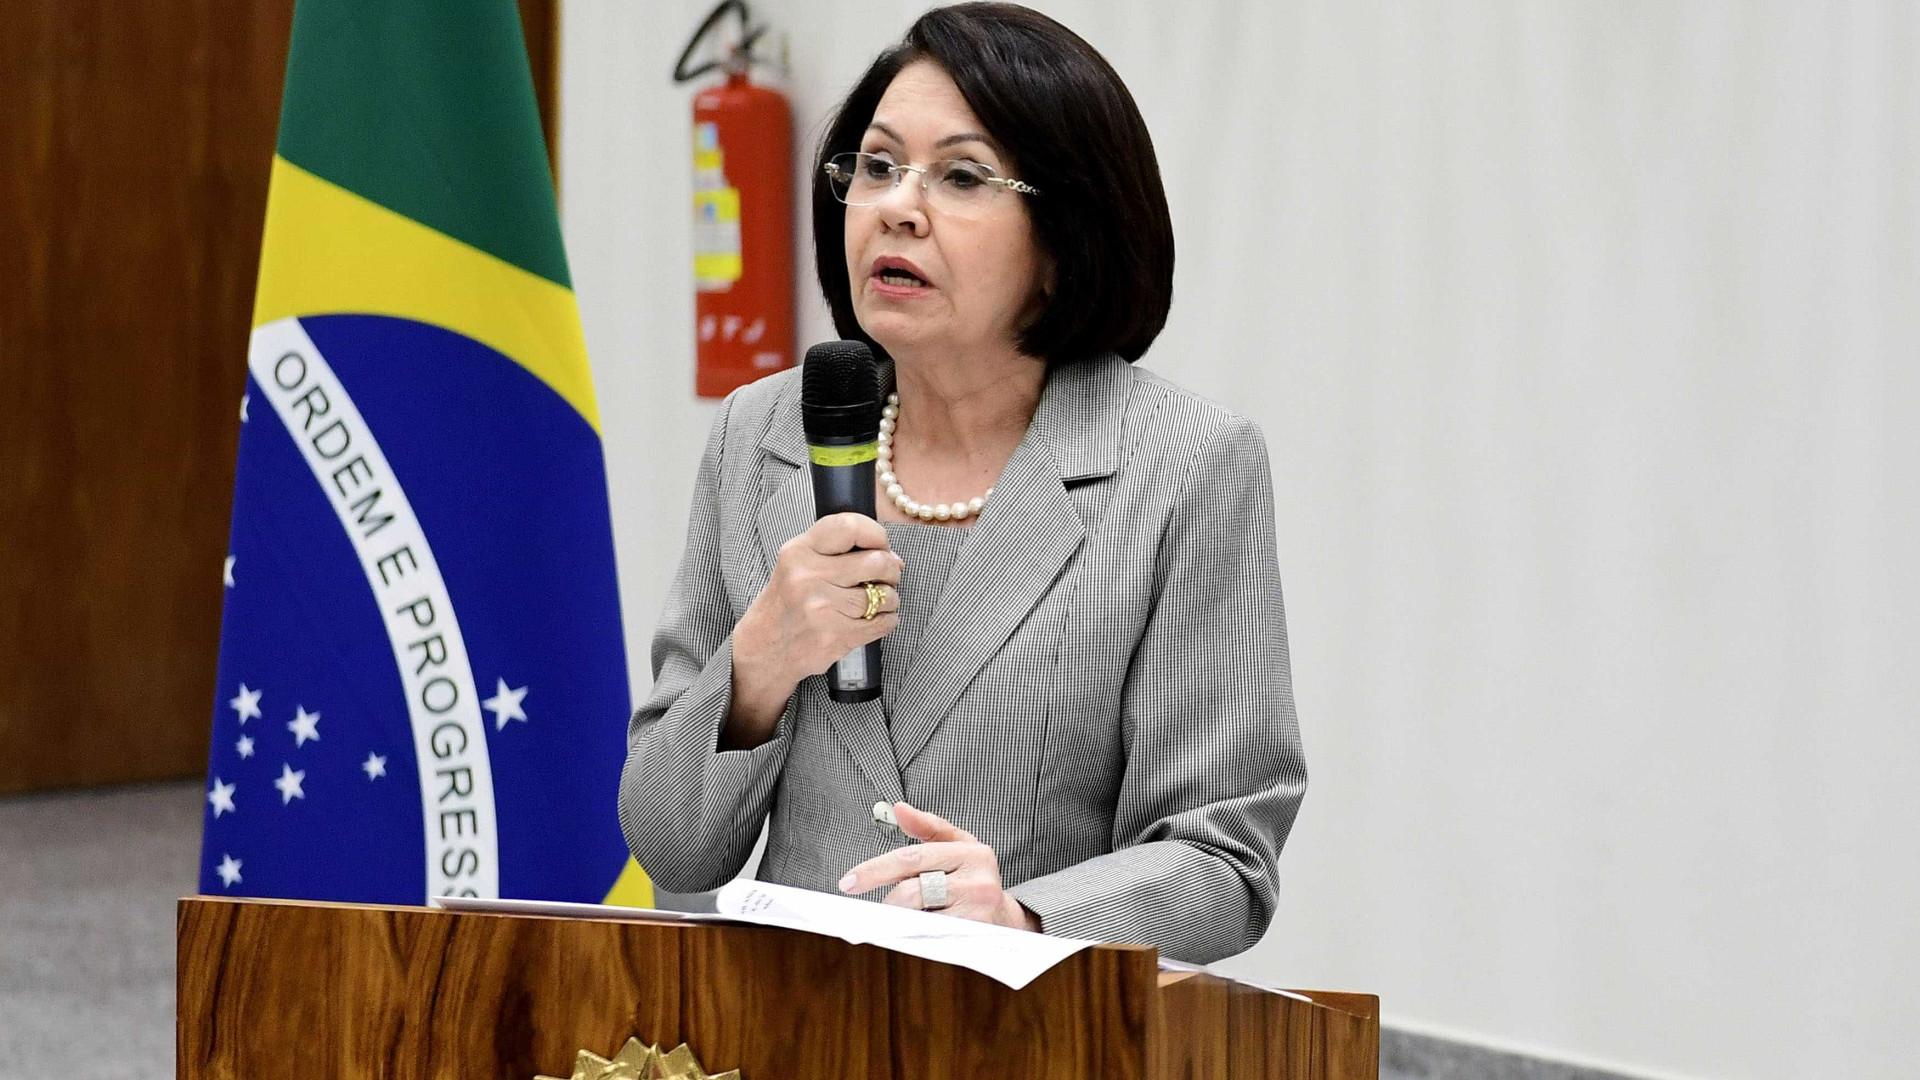 Presidente do STJ nega 143 habeas corpus ao ex-presidente Lula